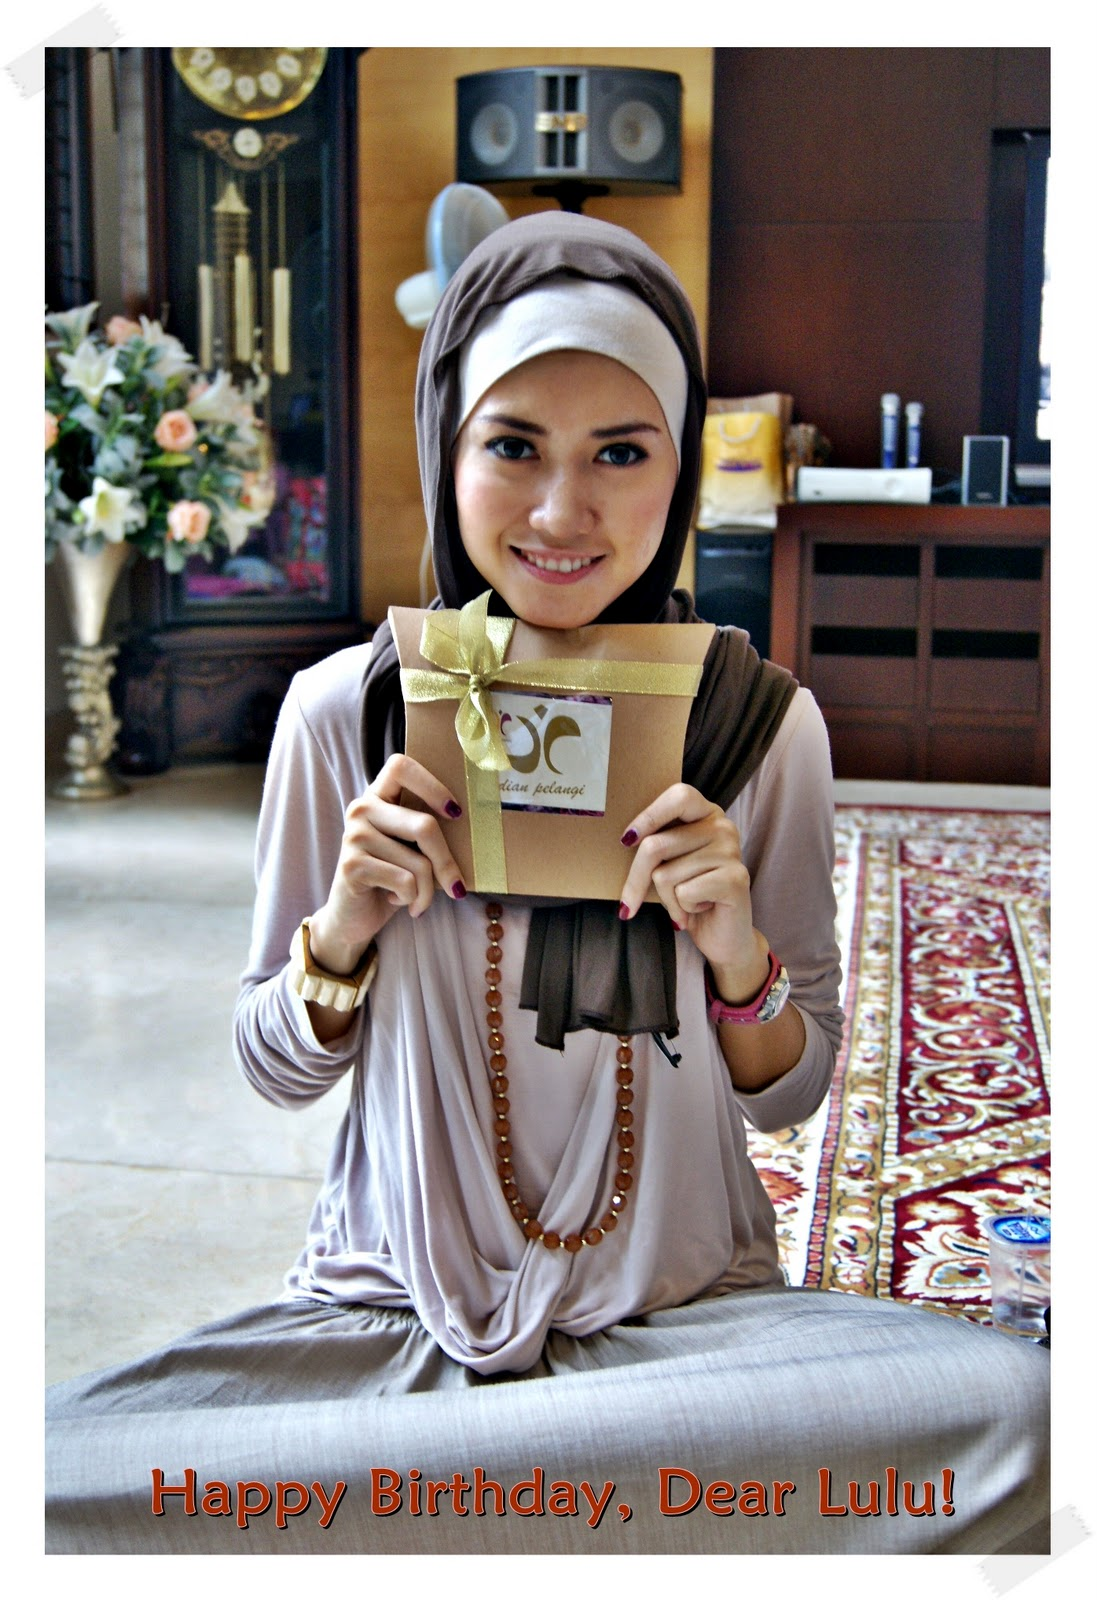 http://1.bp.blogspot.com/_mObHejI-6X8/TPZAR29_0RI/AAAAAAAAADs/TGH3DjVa6-E/s1600/hijabers%20g.JPG